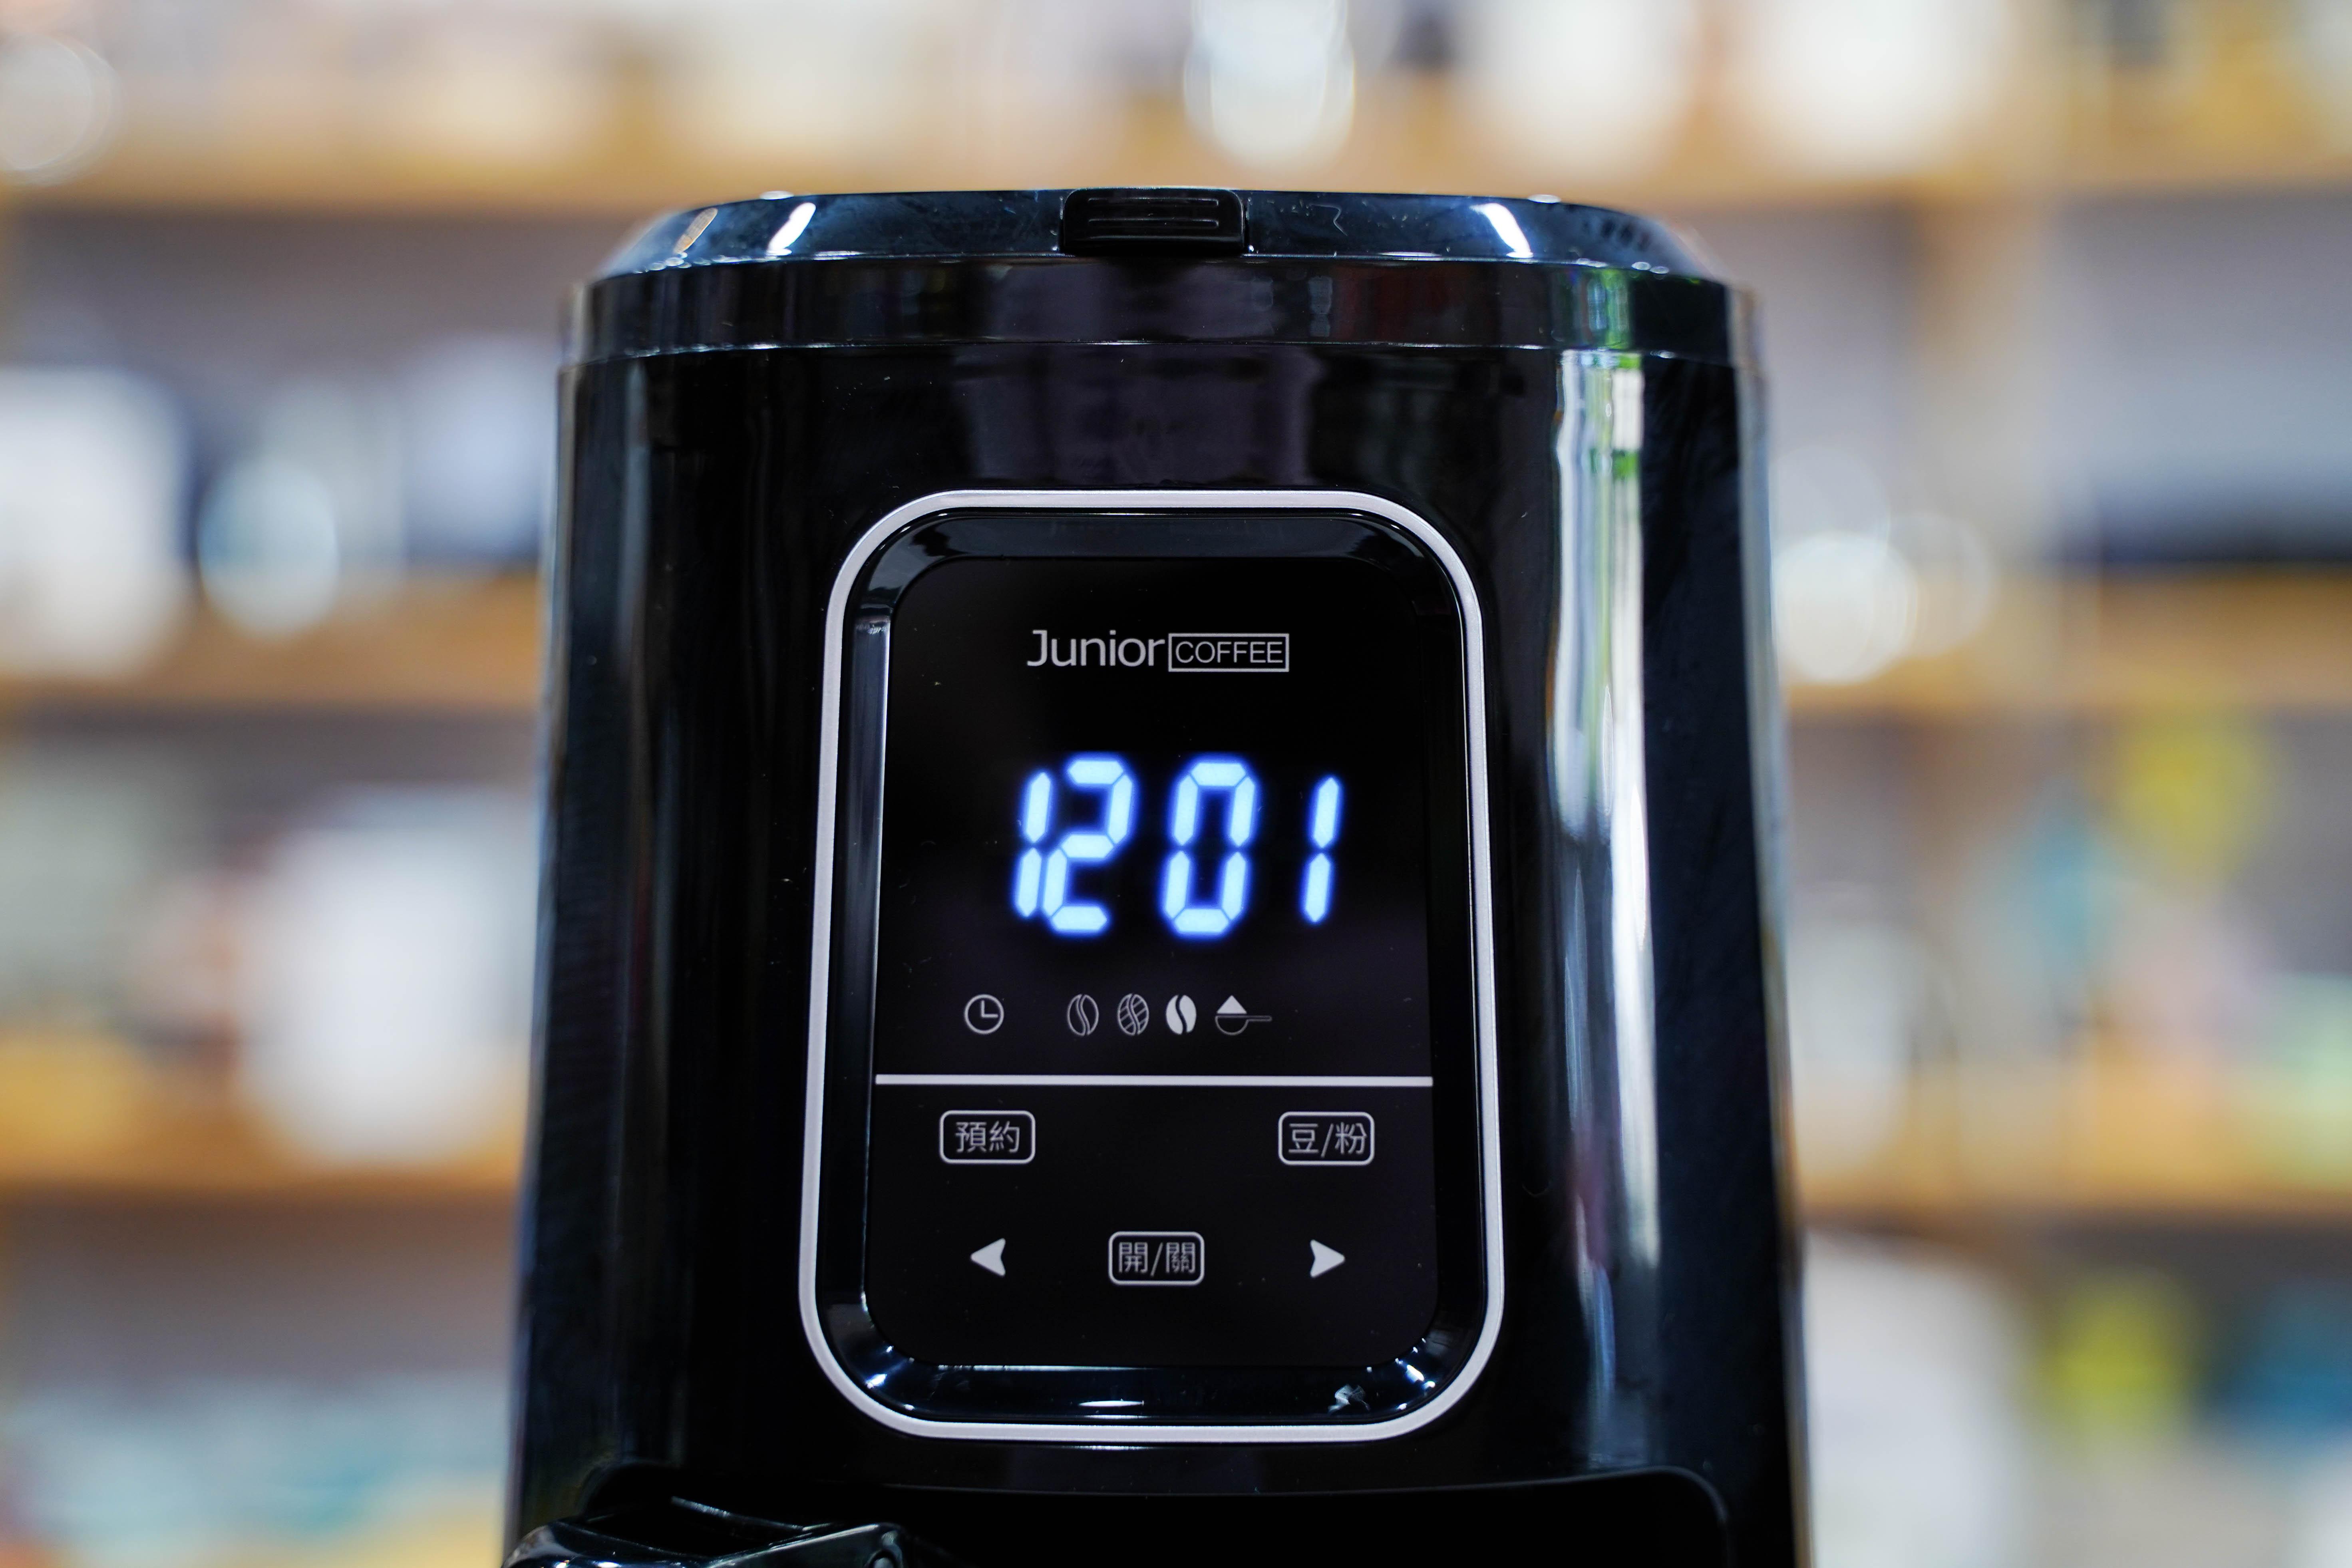 JUNIOR 全自動美式咖啡機 豆 / 粉兩用 可定時預約沖煮 贈咖啡豆 『93 coffee wholesale』 2